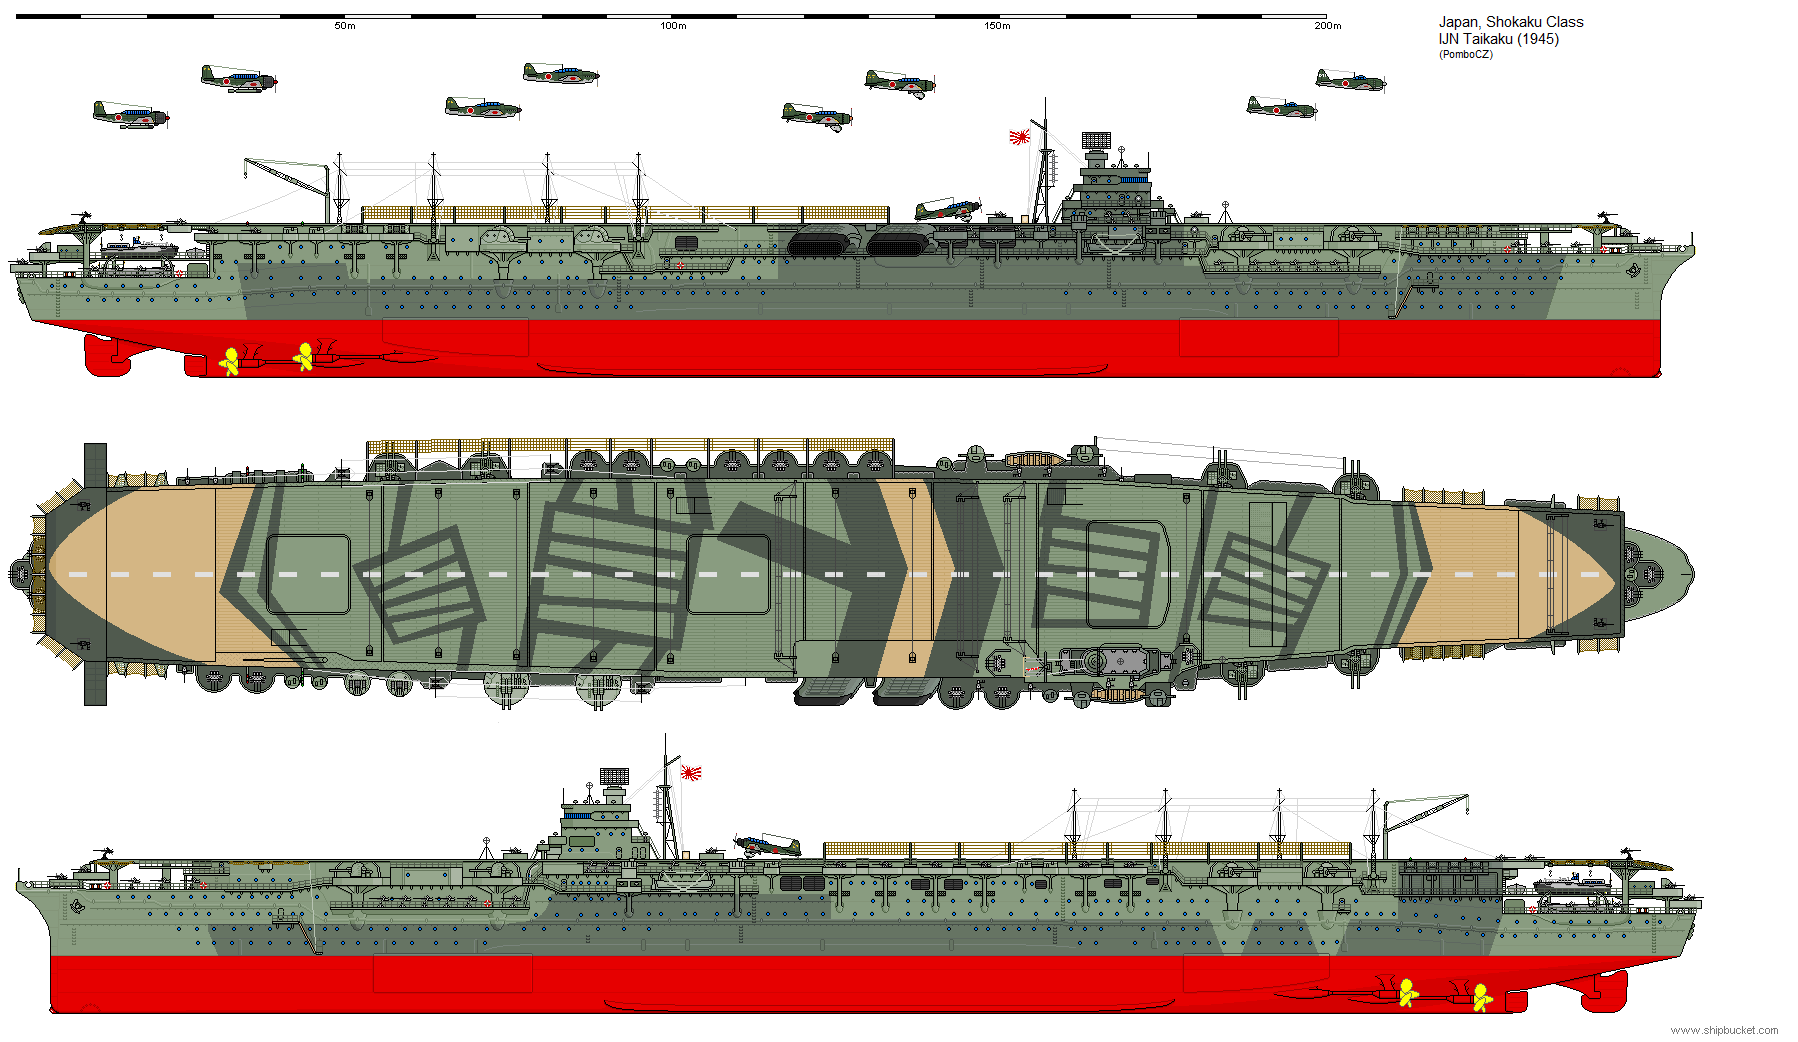 Drawn ship battleship Ulyanovsk Pinterest Pinterest NAVY1 Aircraft